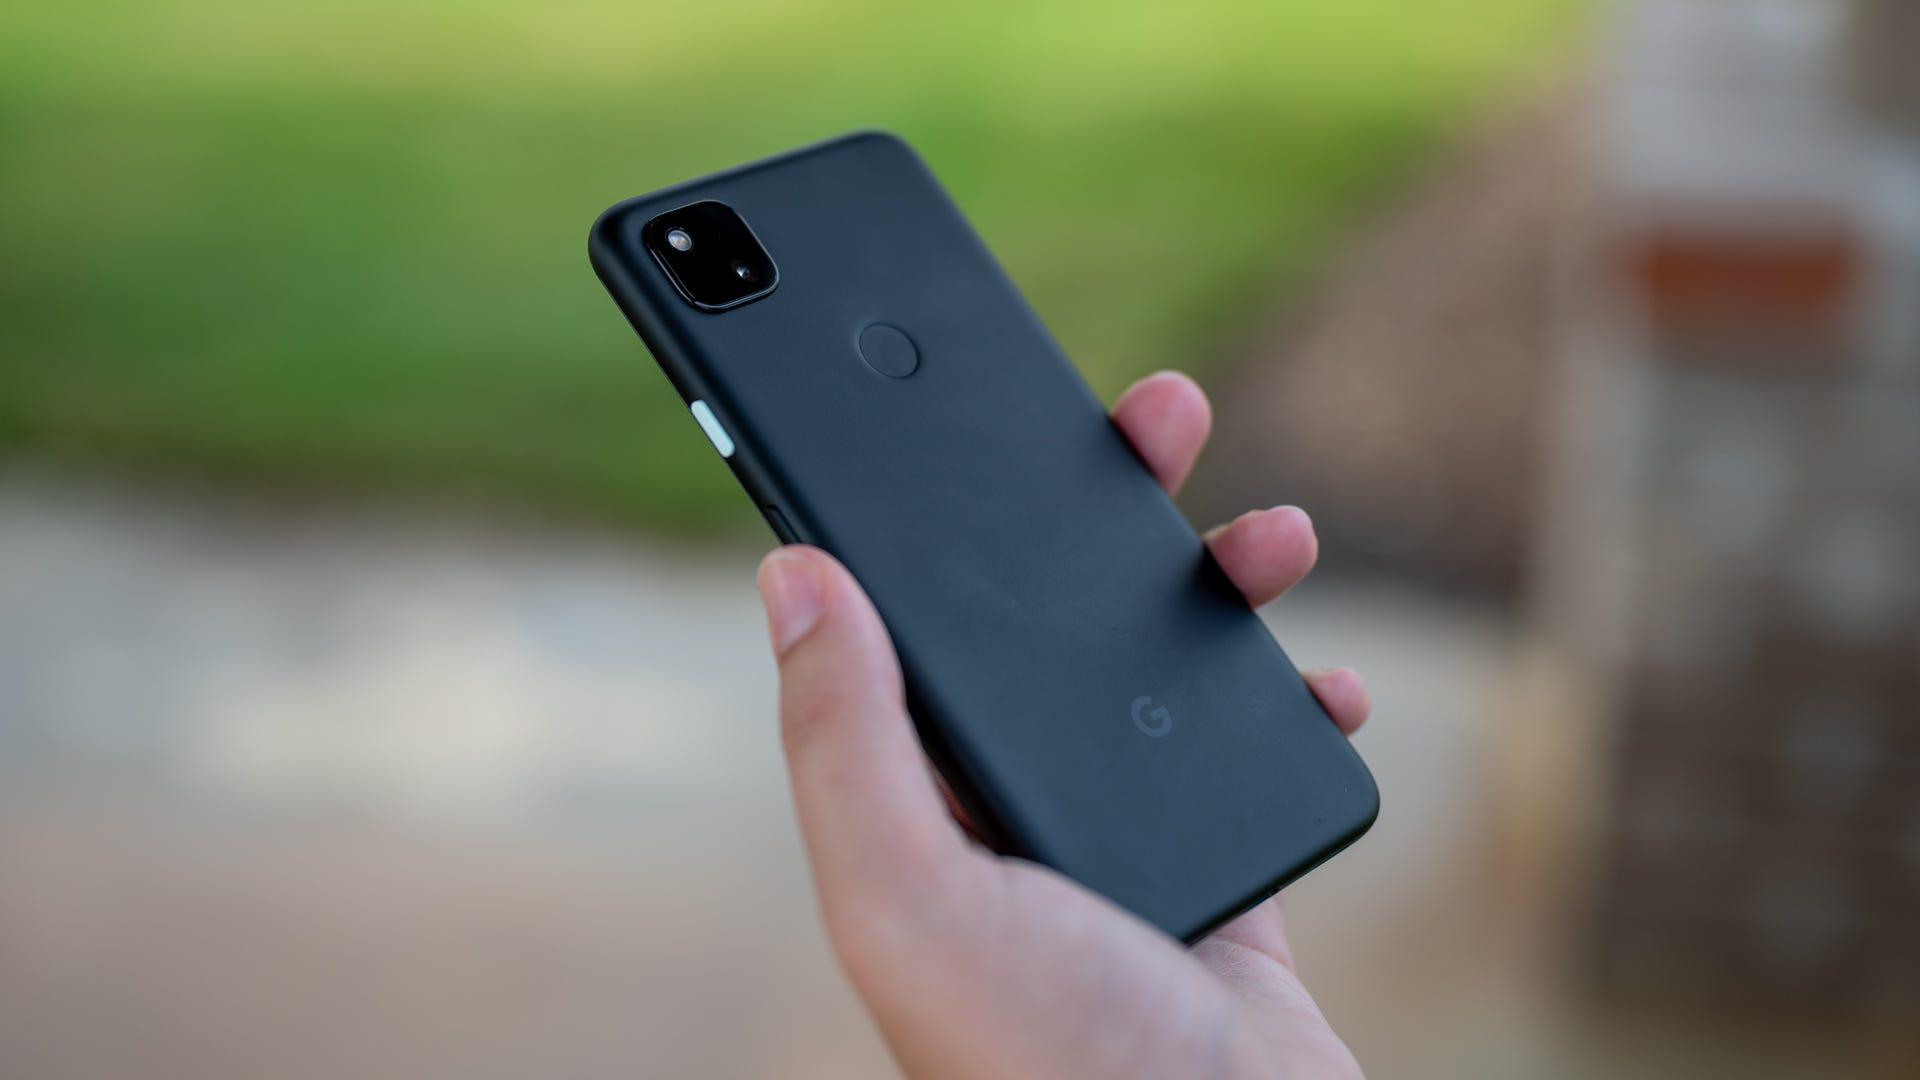 Pixel 4a rear, with fingerprint reader